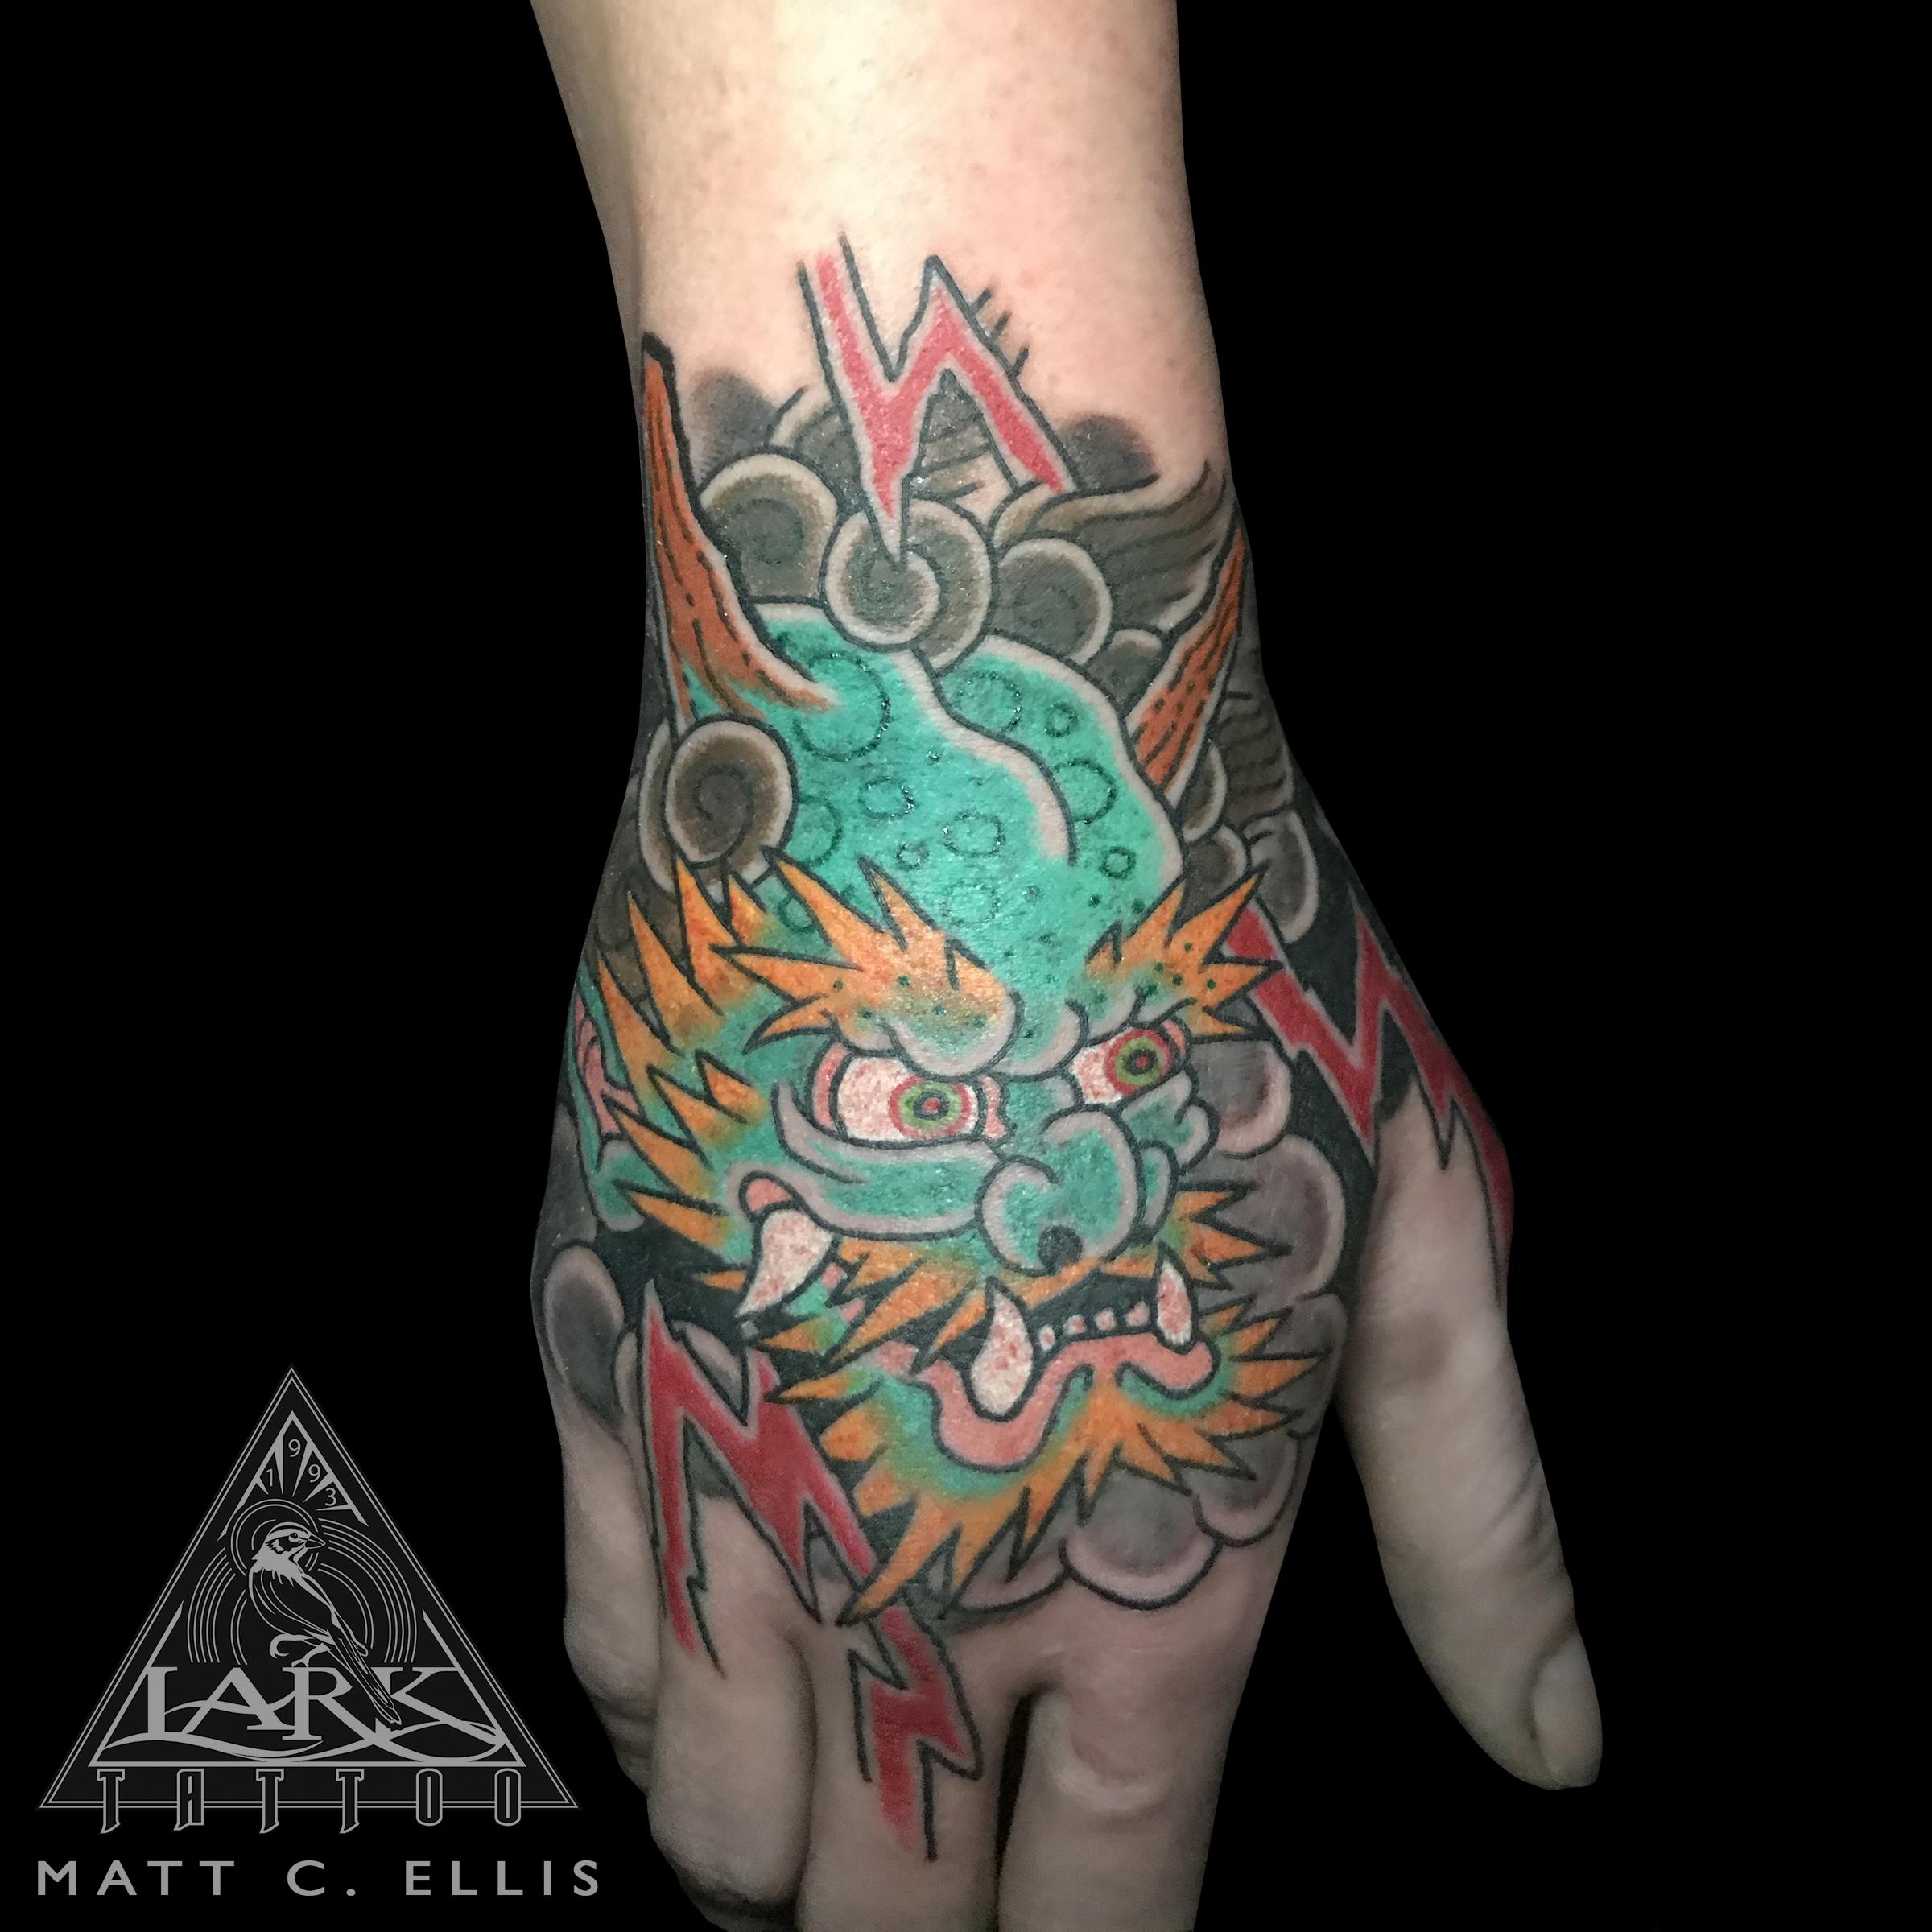 #LarkTattoo #MattEllis #MattEllisLarkTattoo #Tattoo #Tattoos #Oni #OniTattoo #Yokai #YokaiTattoo #YokaiOni #YokaiOniTattoo #Demon #DemonTattoo #Ogre #OgreTattoo #Japanese #JapaneseTattoo #JapaneseColorTattoo #ColorTattoo #JapaneseFolklore #JapaneseFolkloreTattoo #Folklore #FolkloreTattoo #JapaneseArt #JapaneseArtTattoo #Hand #HandTattoo #JapaneseYokai #JapaneseYokaiTattoo #TattooArtist #Tattoist #Tattooer #LongIslandTattooArtist #LongIslandTattooer #LongIslandTattoo #TattooOfTheDay #Tat #Tats #Tatts #Tatted #Inked #Ink #TattooInk #AmazingInk #AmazingTattoo #BodyArt #LarkTattooWestbury #Westbury #LongIsland #NY #NewYork #USA #Art #Tattedup #InkedUp #LarkTattoos